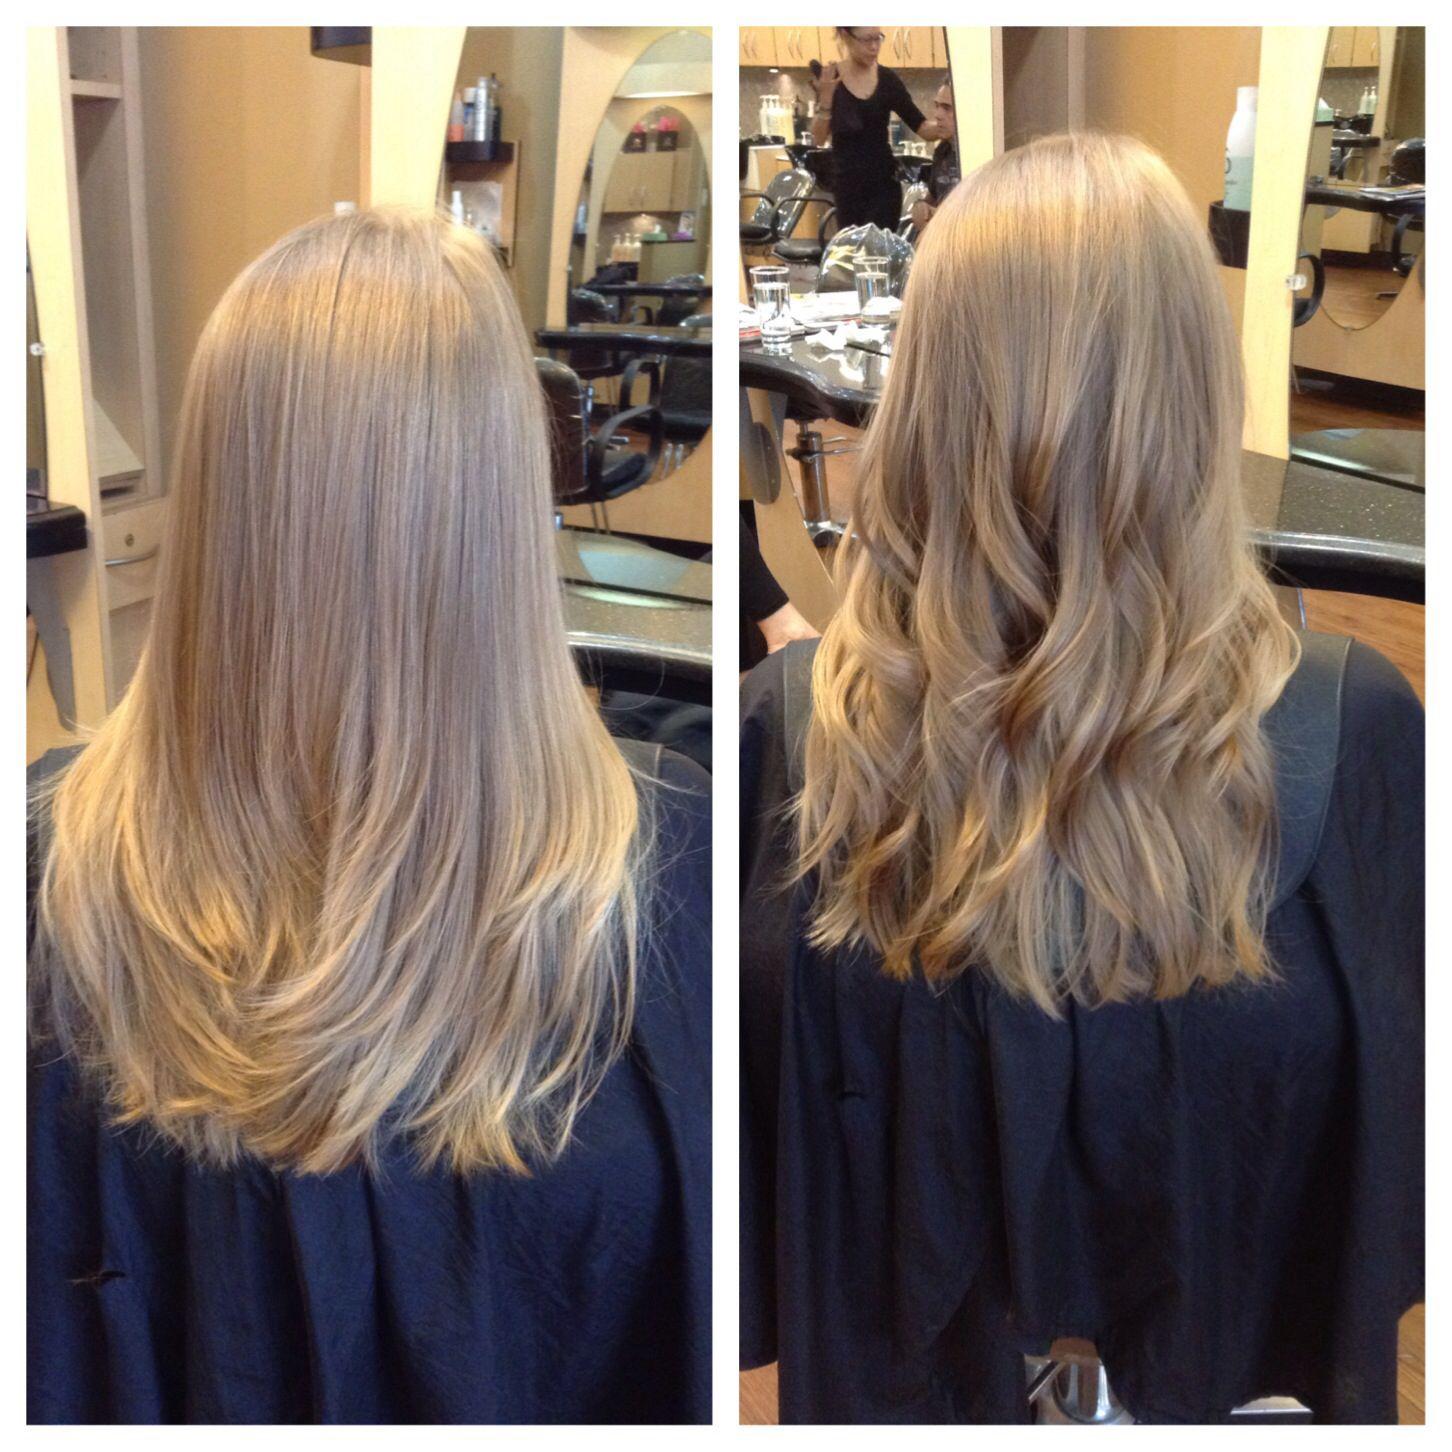 Long layered razor cut - straigh vs wavy